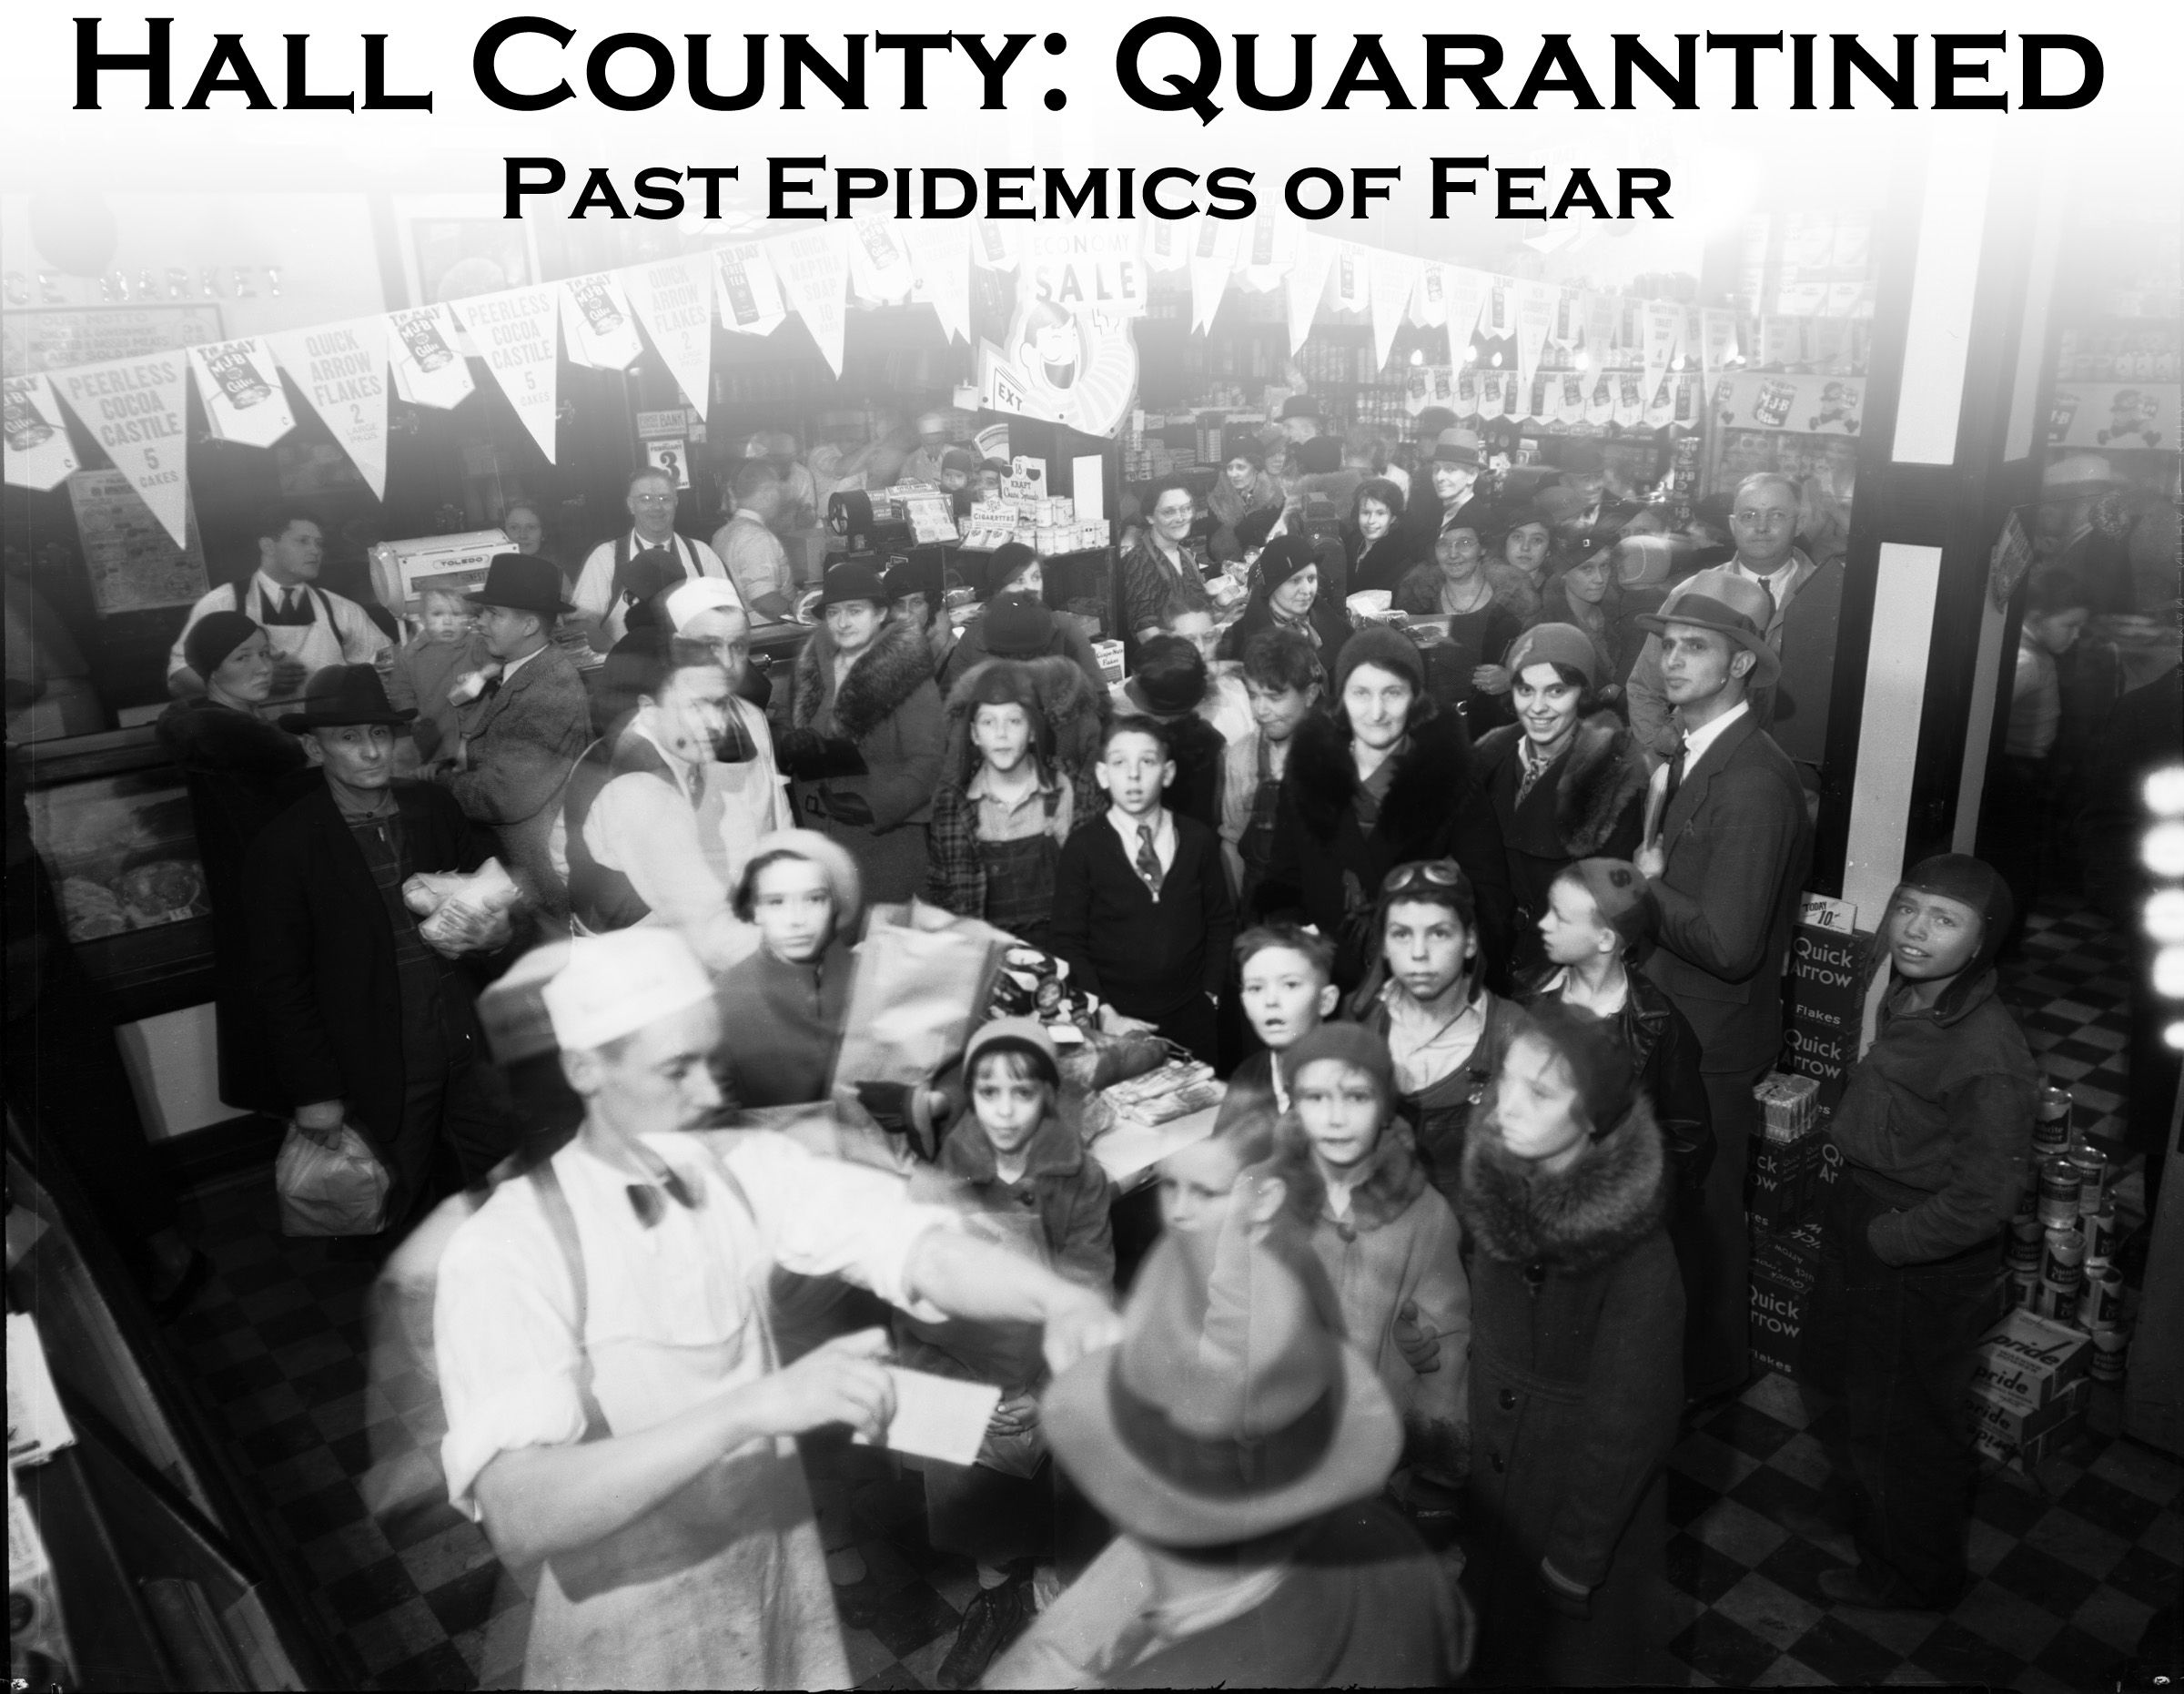 Hall County: Quarantined